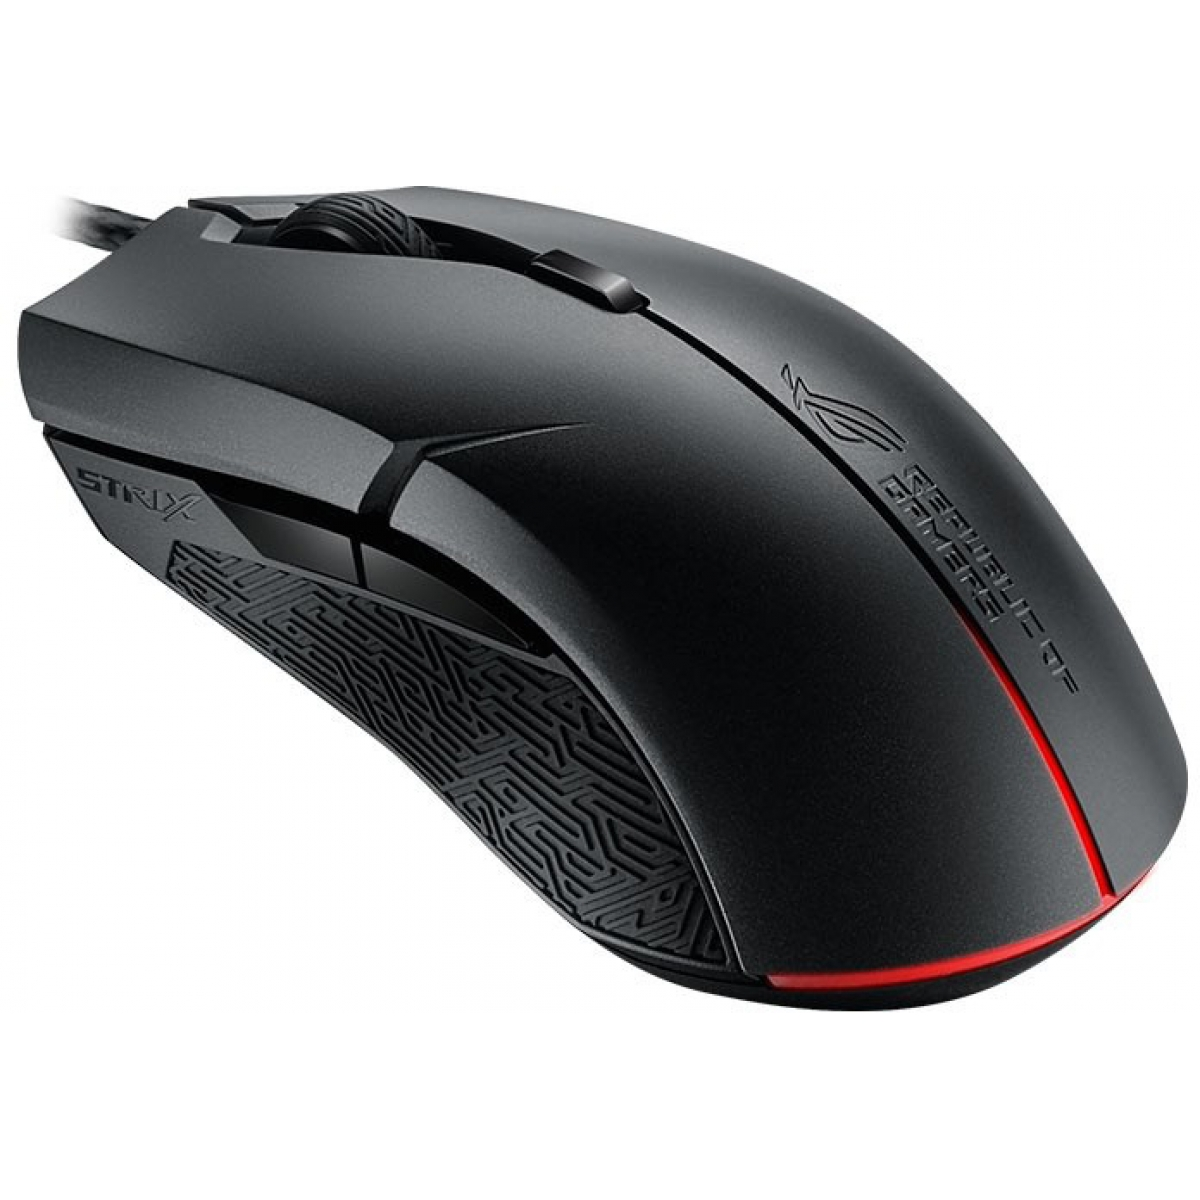 Mouse Gamer Asus Rog Strix Evolve p302 8 Botões Programáveis 7200 DPI RGB Preto